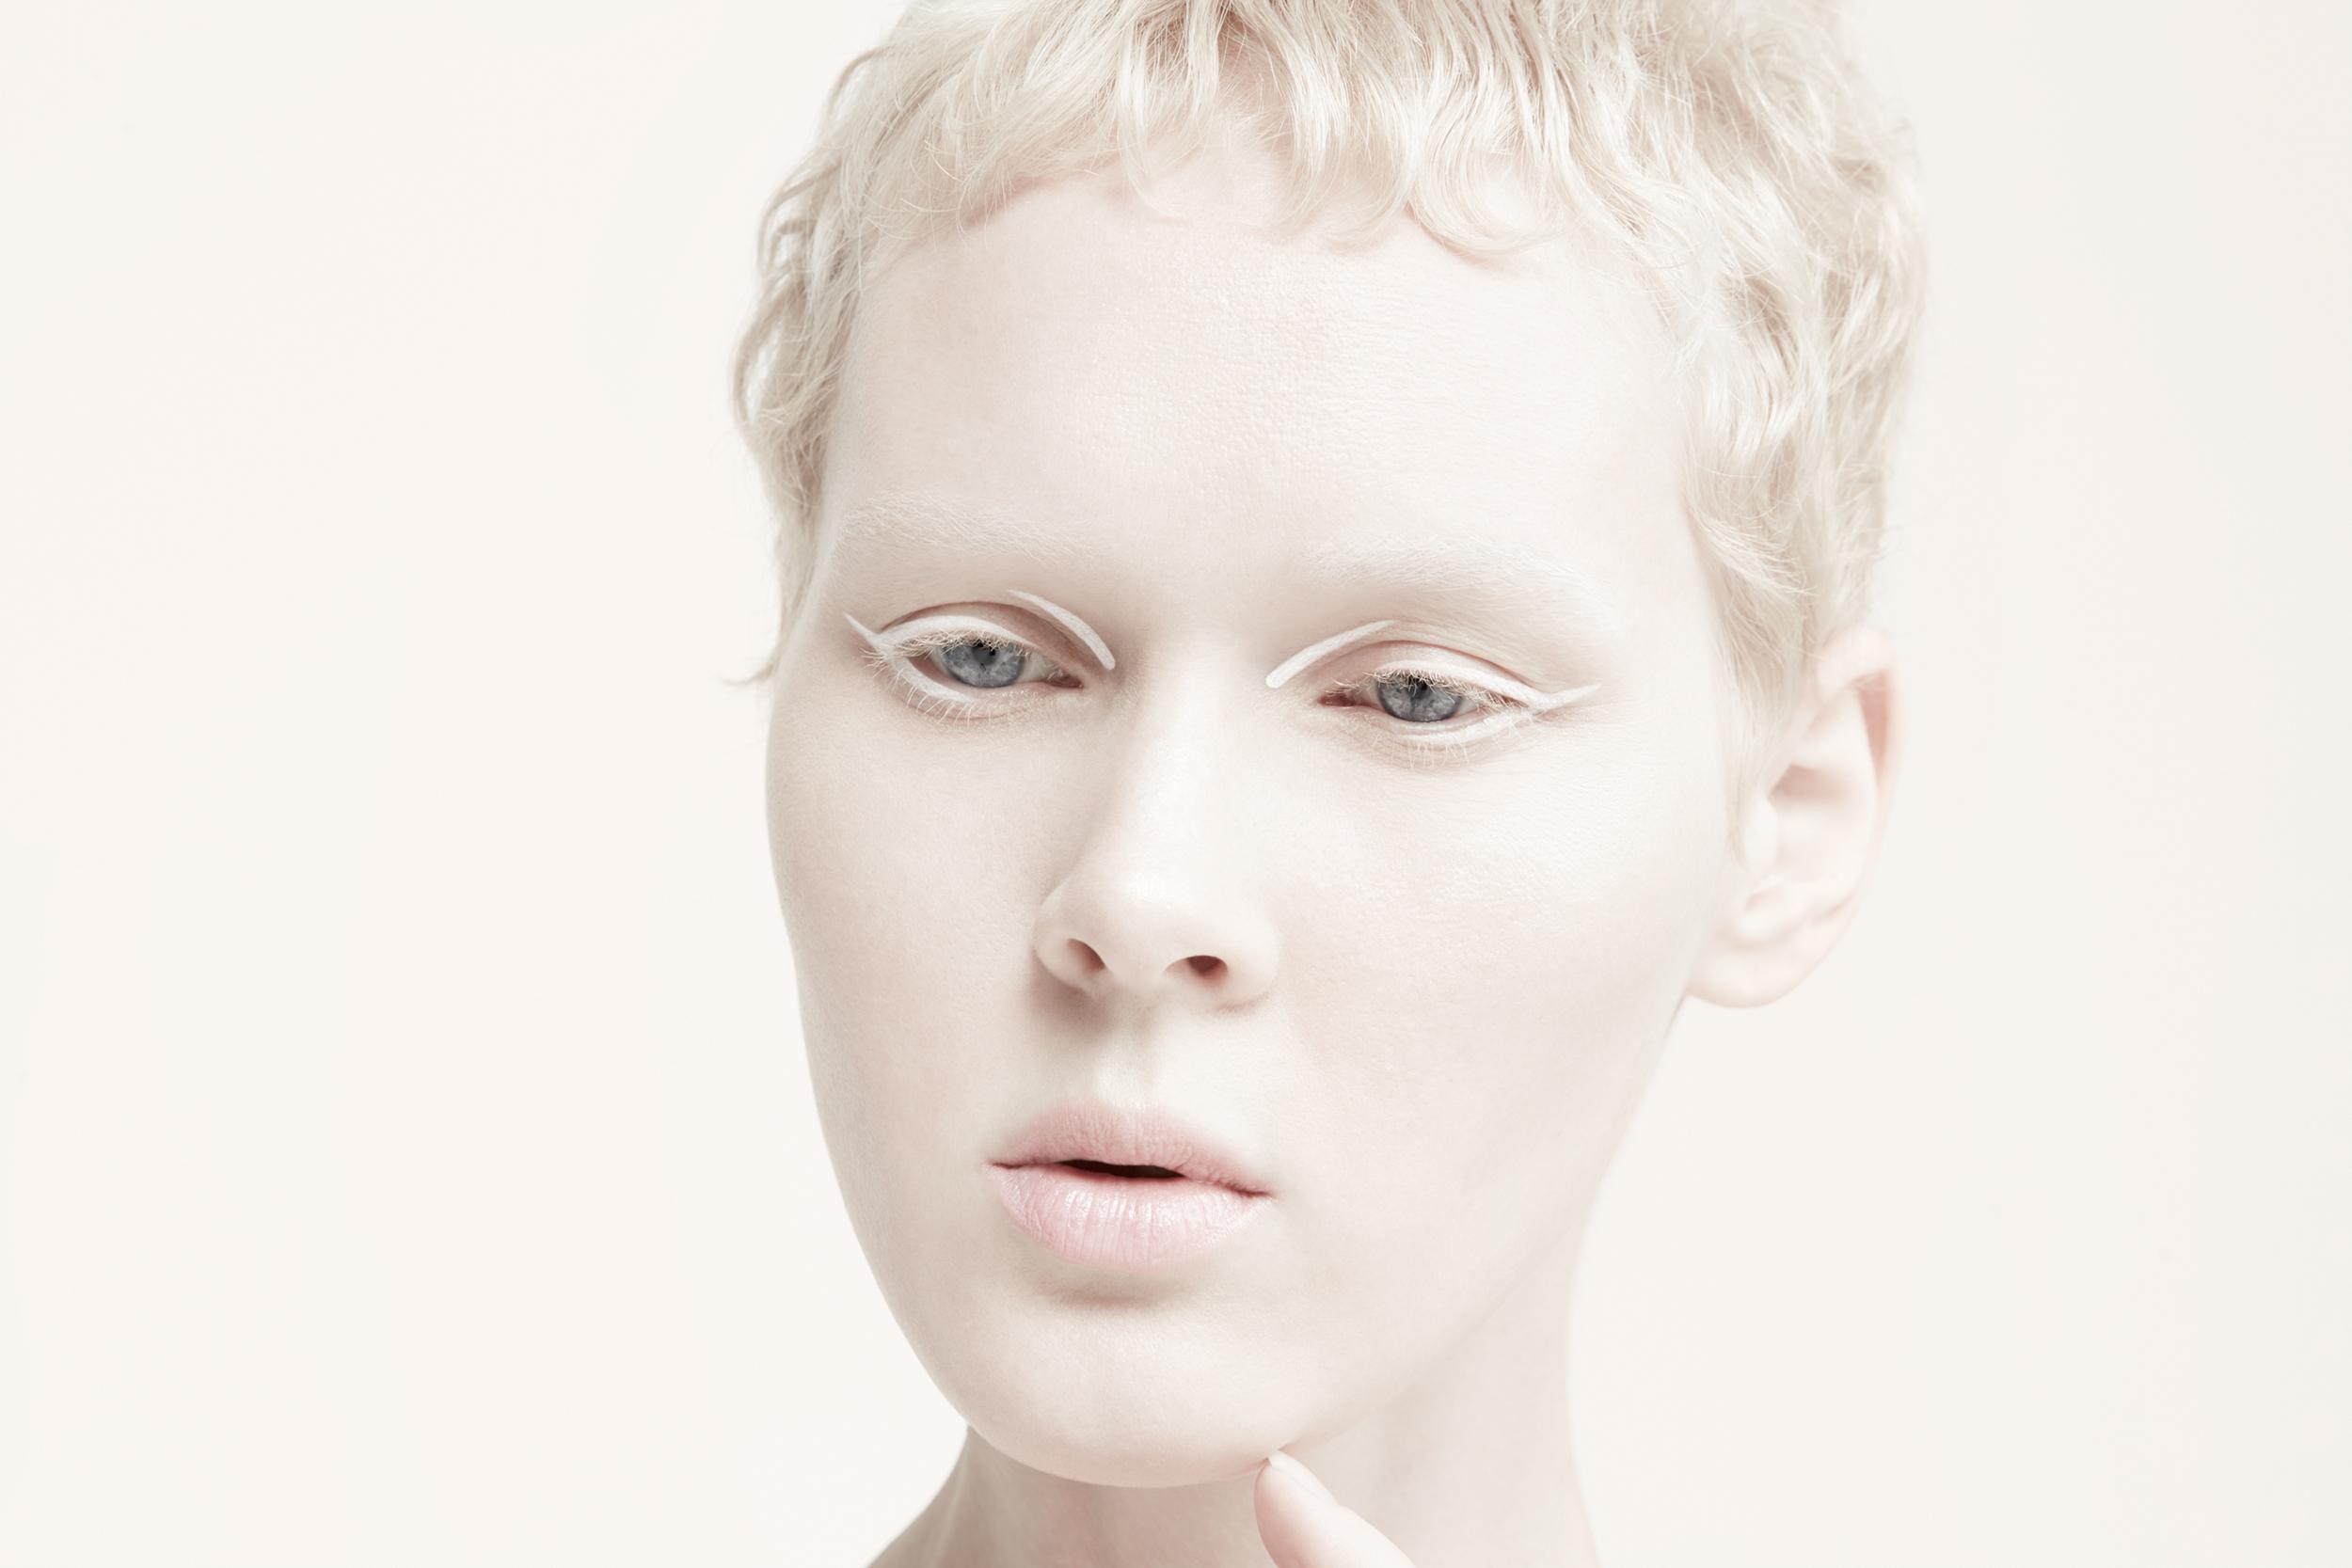 Photography by  Martina Tolot   Model:  Annie Montgomery  @  Photogenics LA   Makeup by  Alexa N. Hernandez  @  Wilhelmina LA  using  MAC Cosmetics